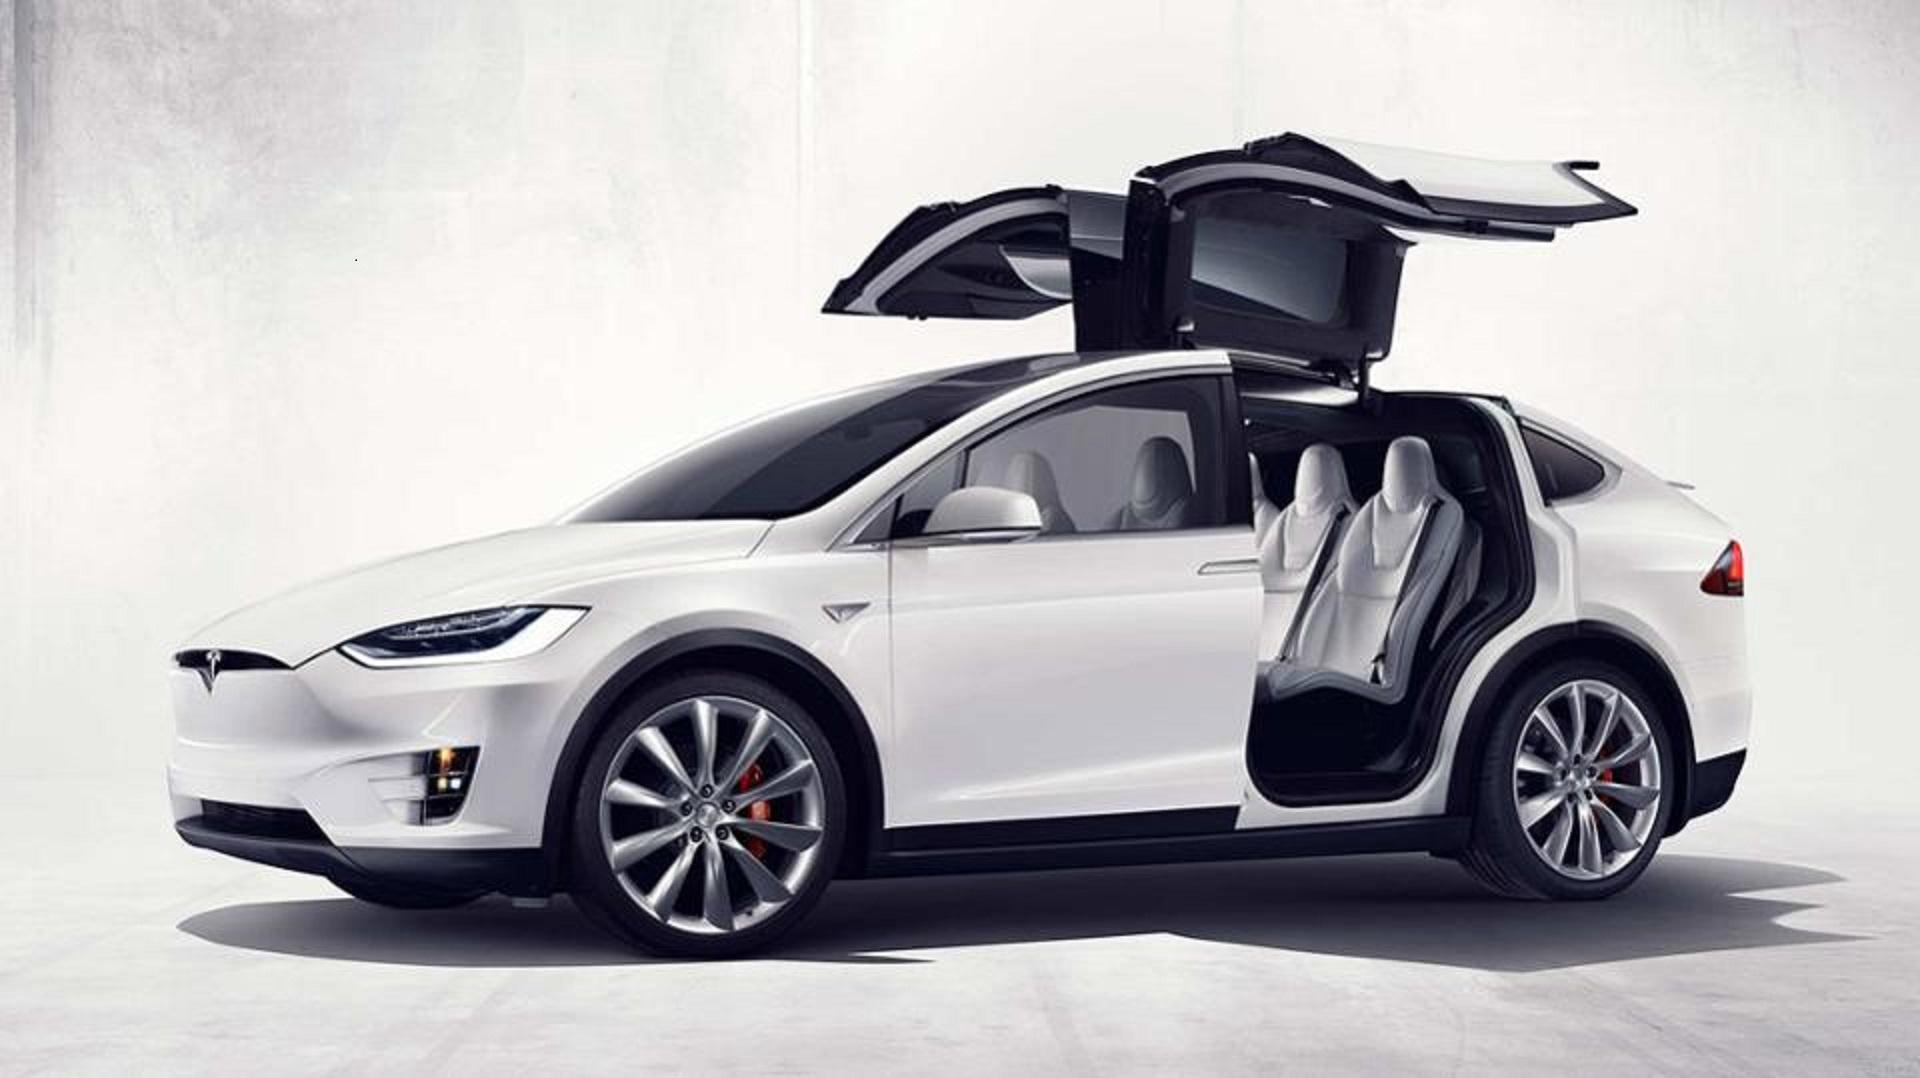 trộm xe,ô tô Mỹ,Subaru,Tesla,BMW